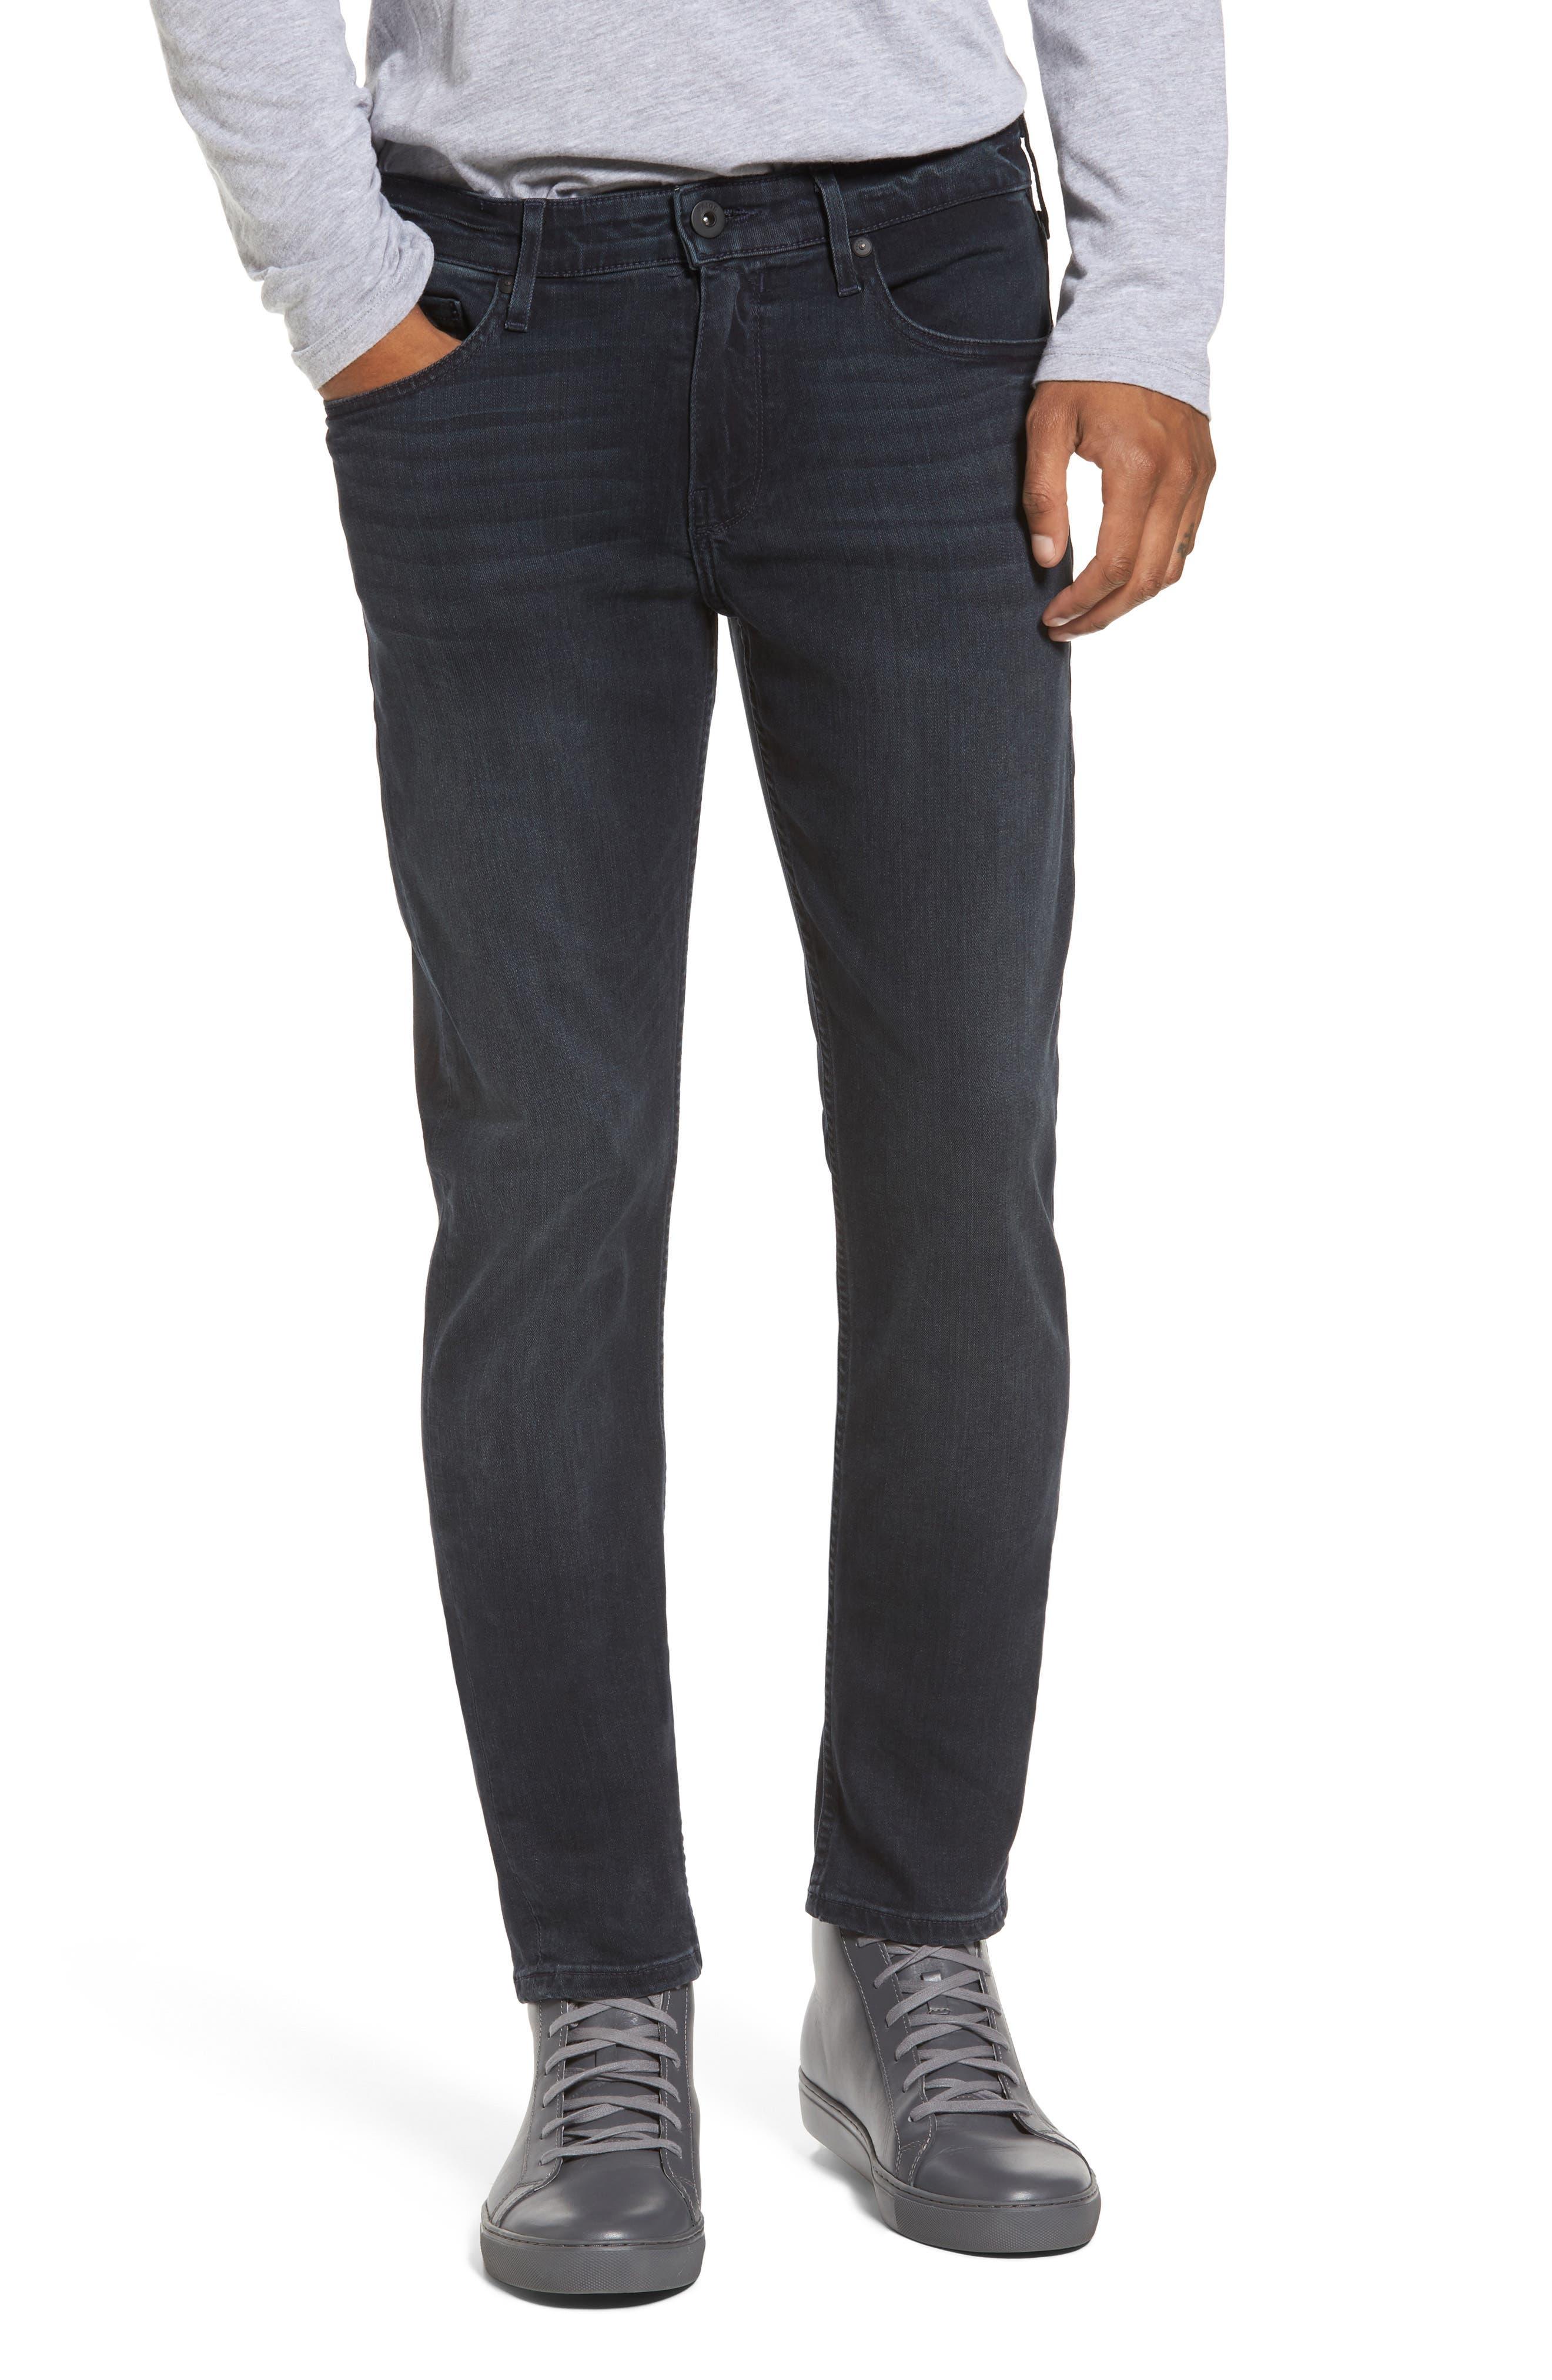 PAIGE Transcend - Croft Skinny Fit Jeans (Beckett)